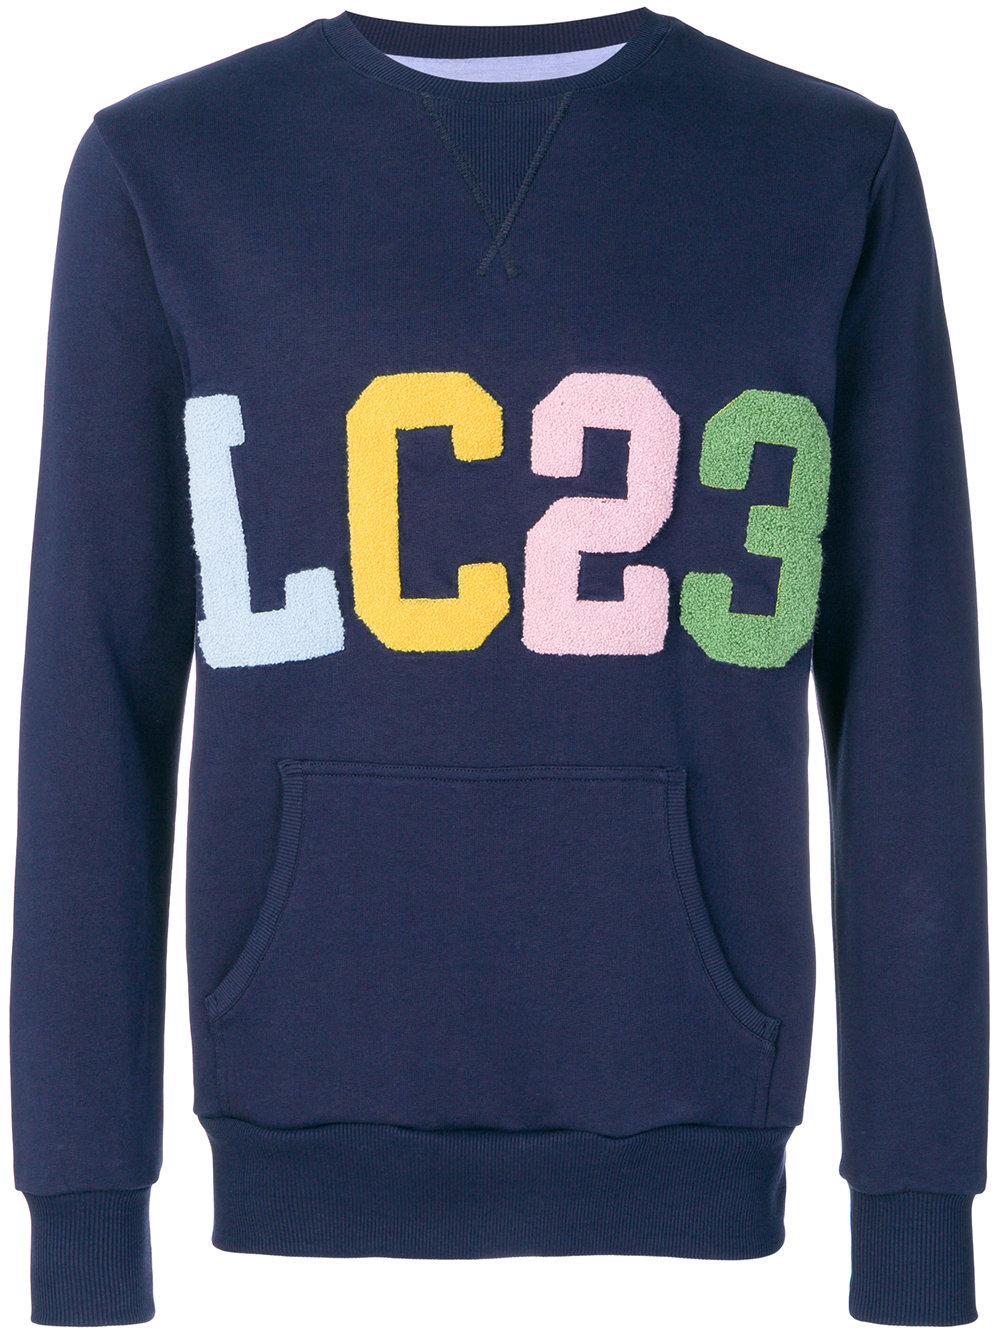 Lc23 Blue